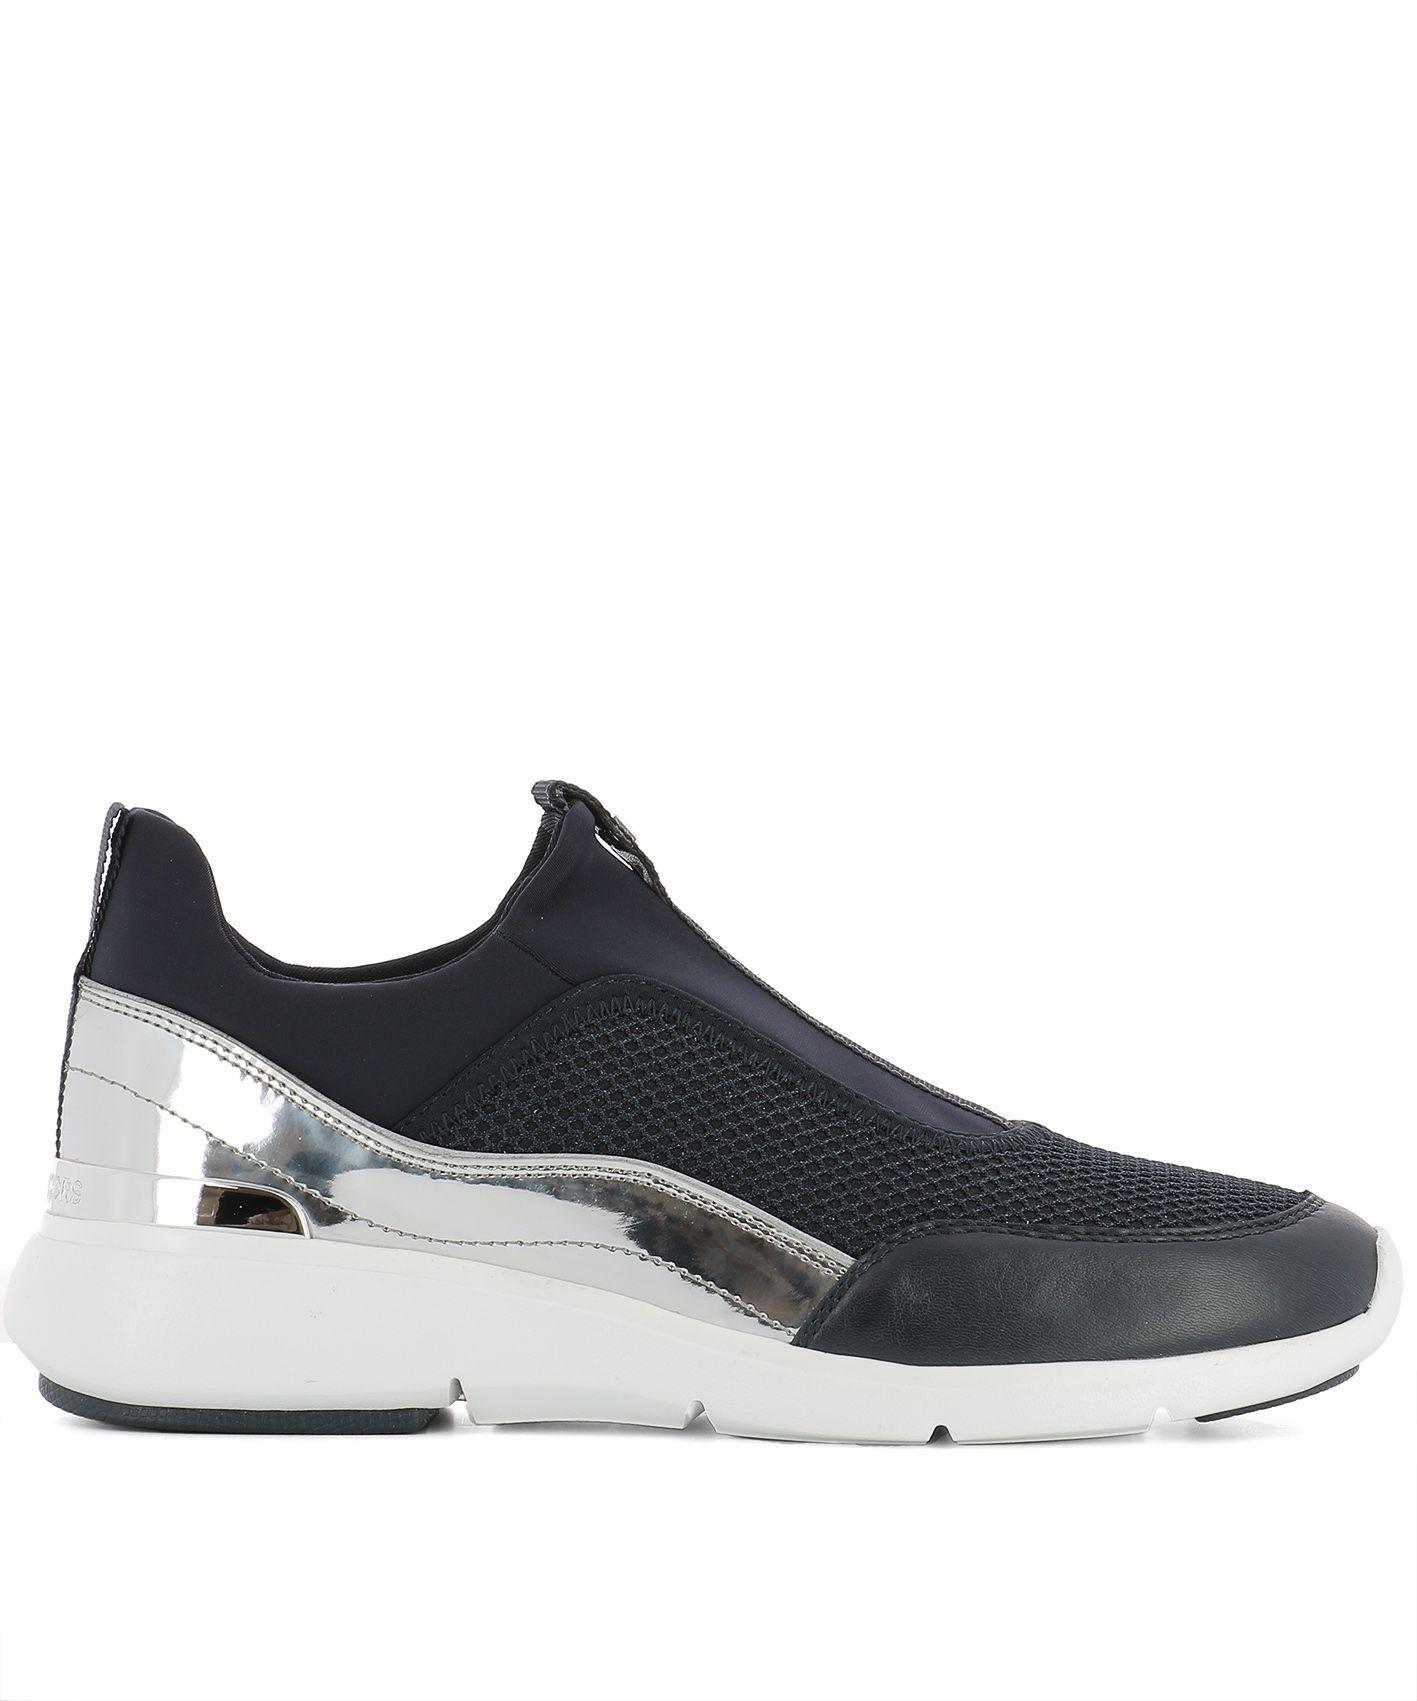 Michael Kors Blue Fabric Sneakers